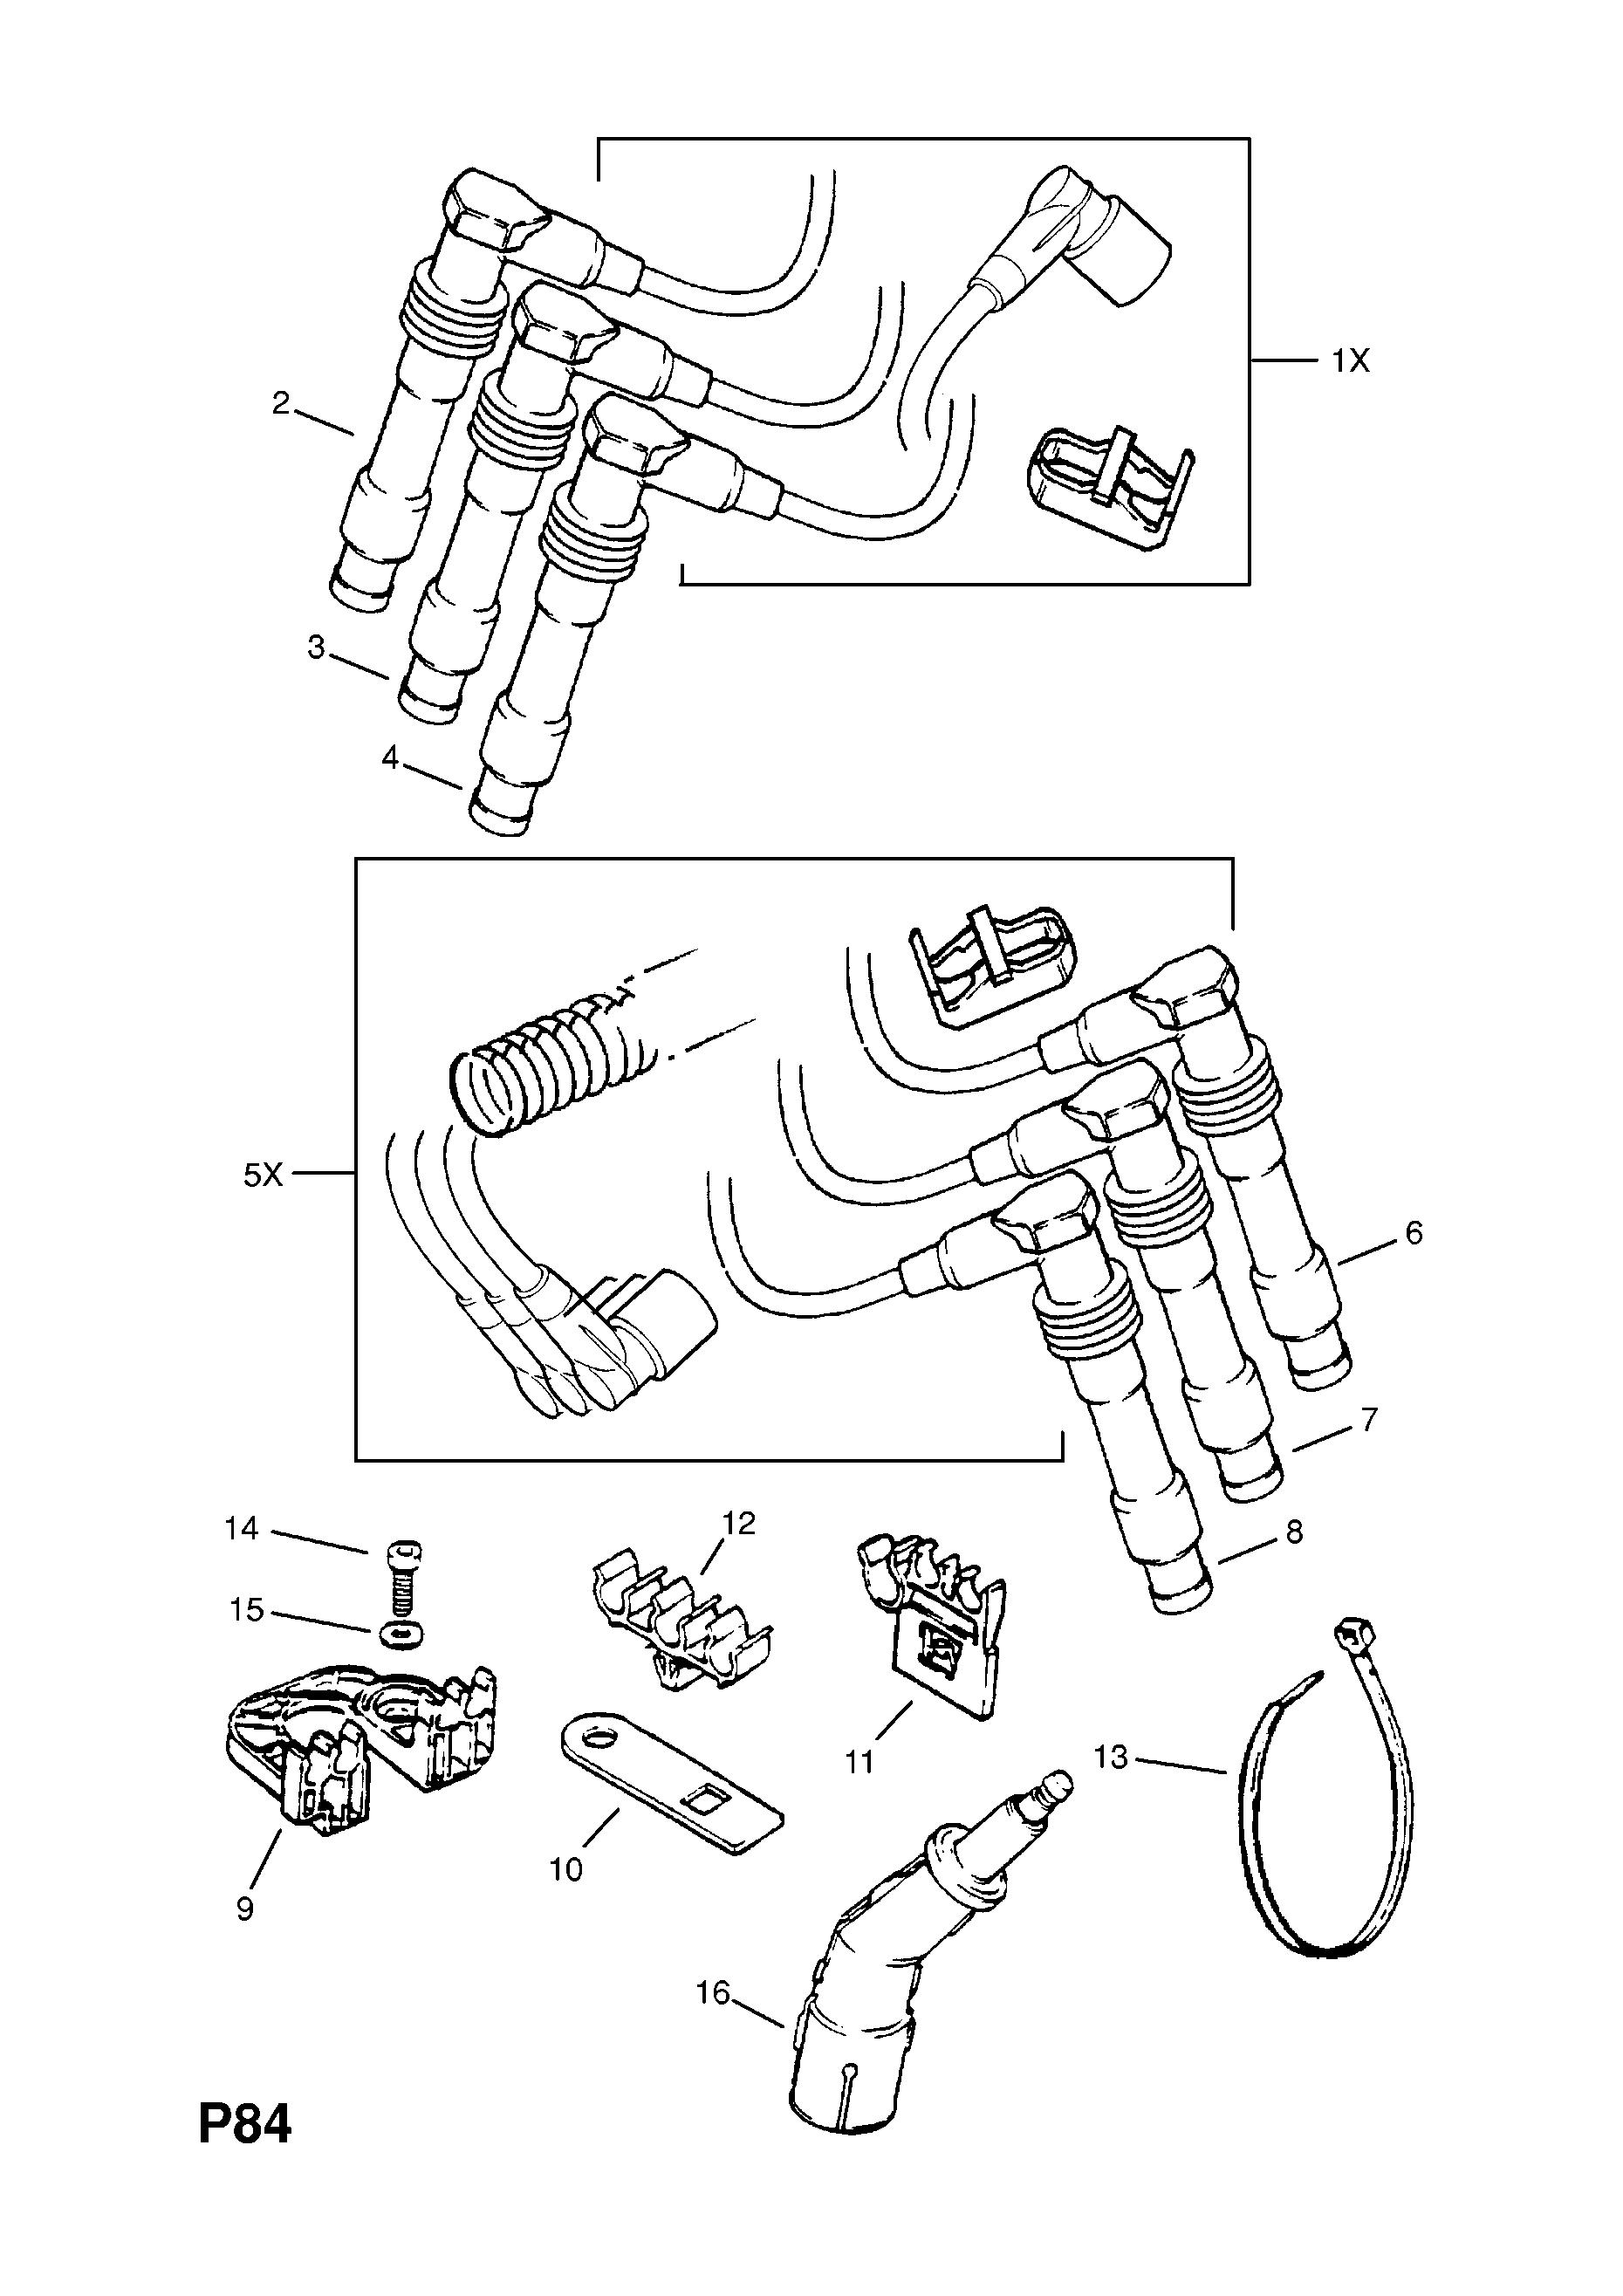 Tractor Wiring Yanmar Diagramsym1601d